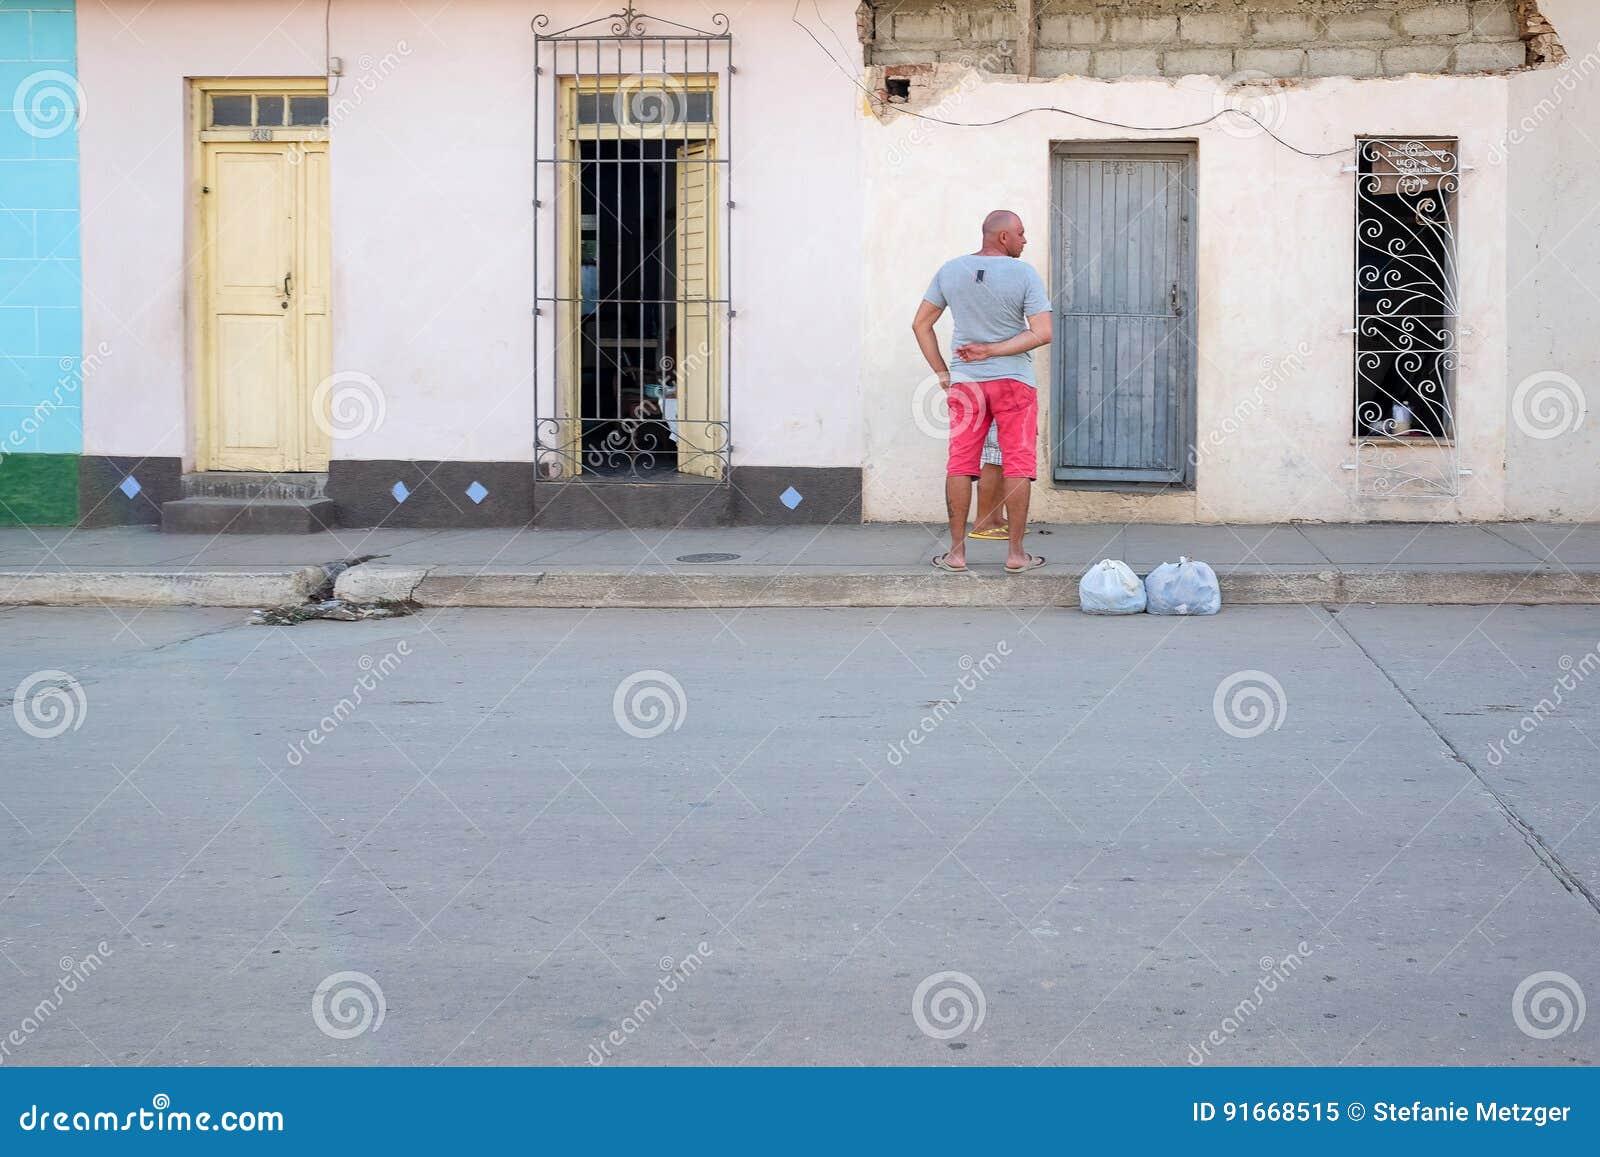 Straßenleben in Trinidad, Kuba